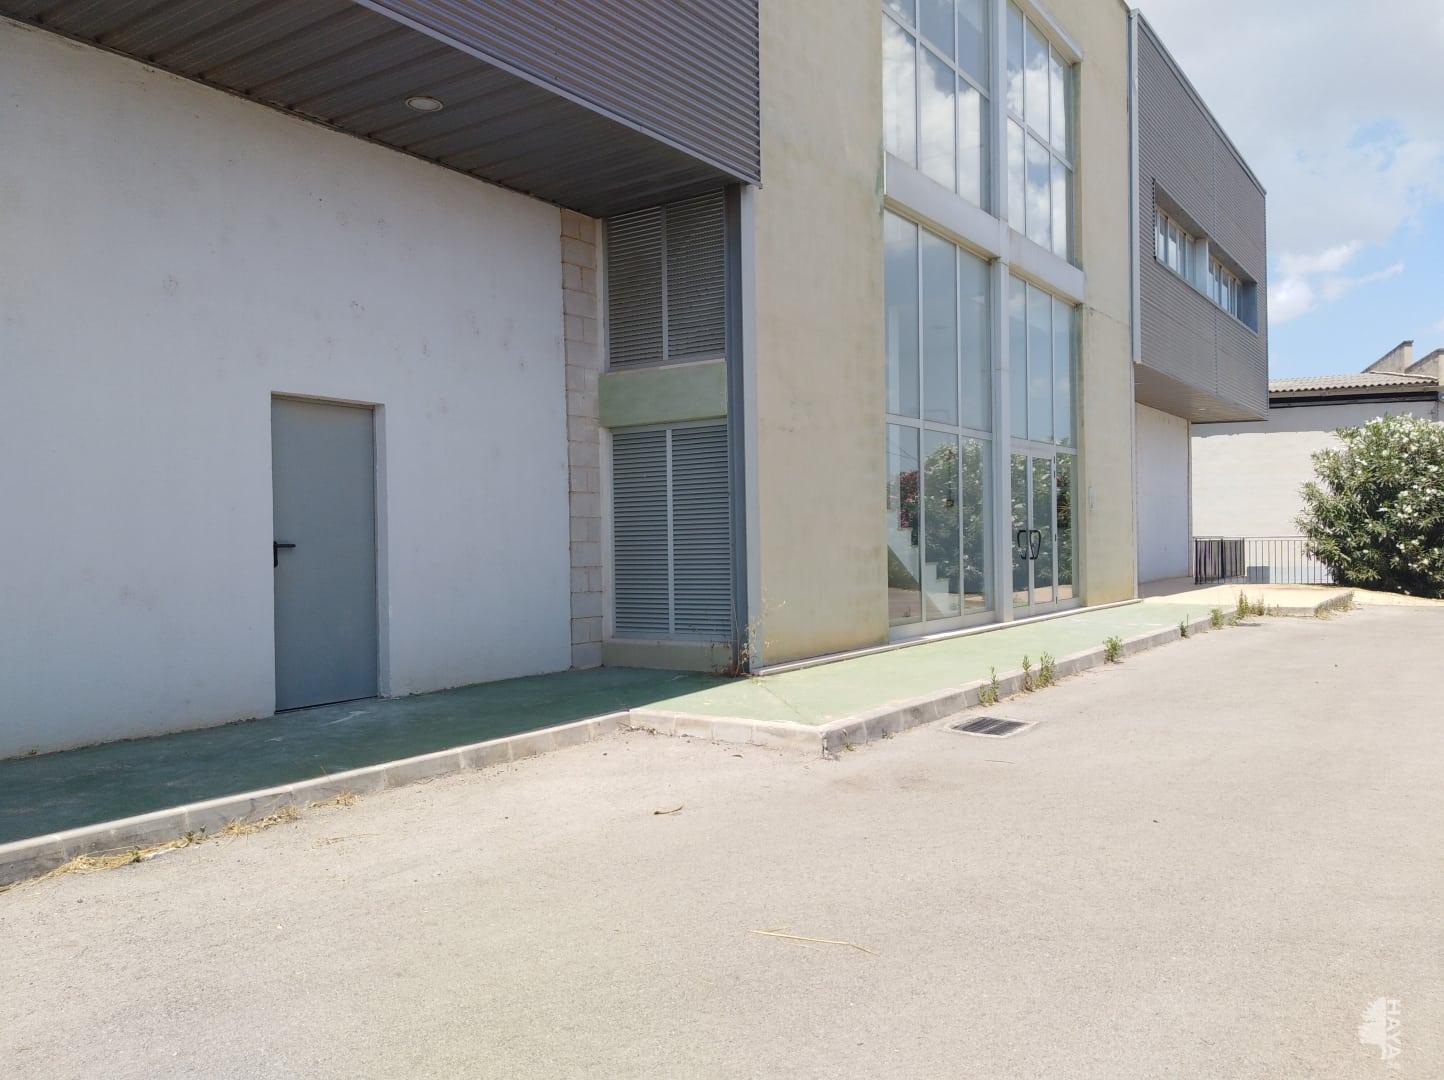 Oficina en venta en Porreres, Baleares, Carretera Campos, 145.392 €, 172 m2